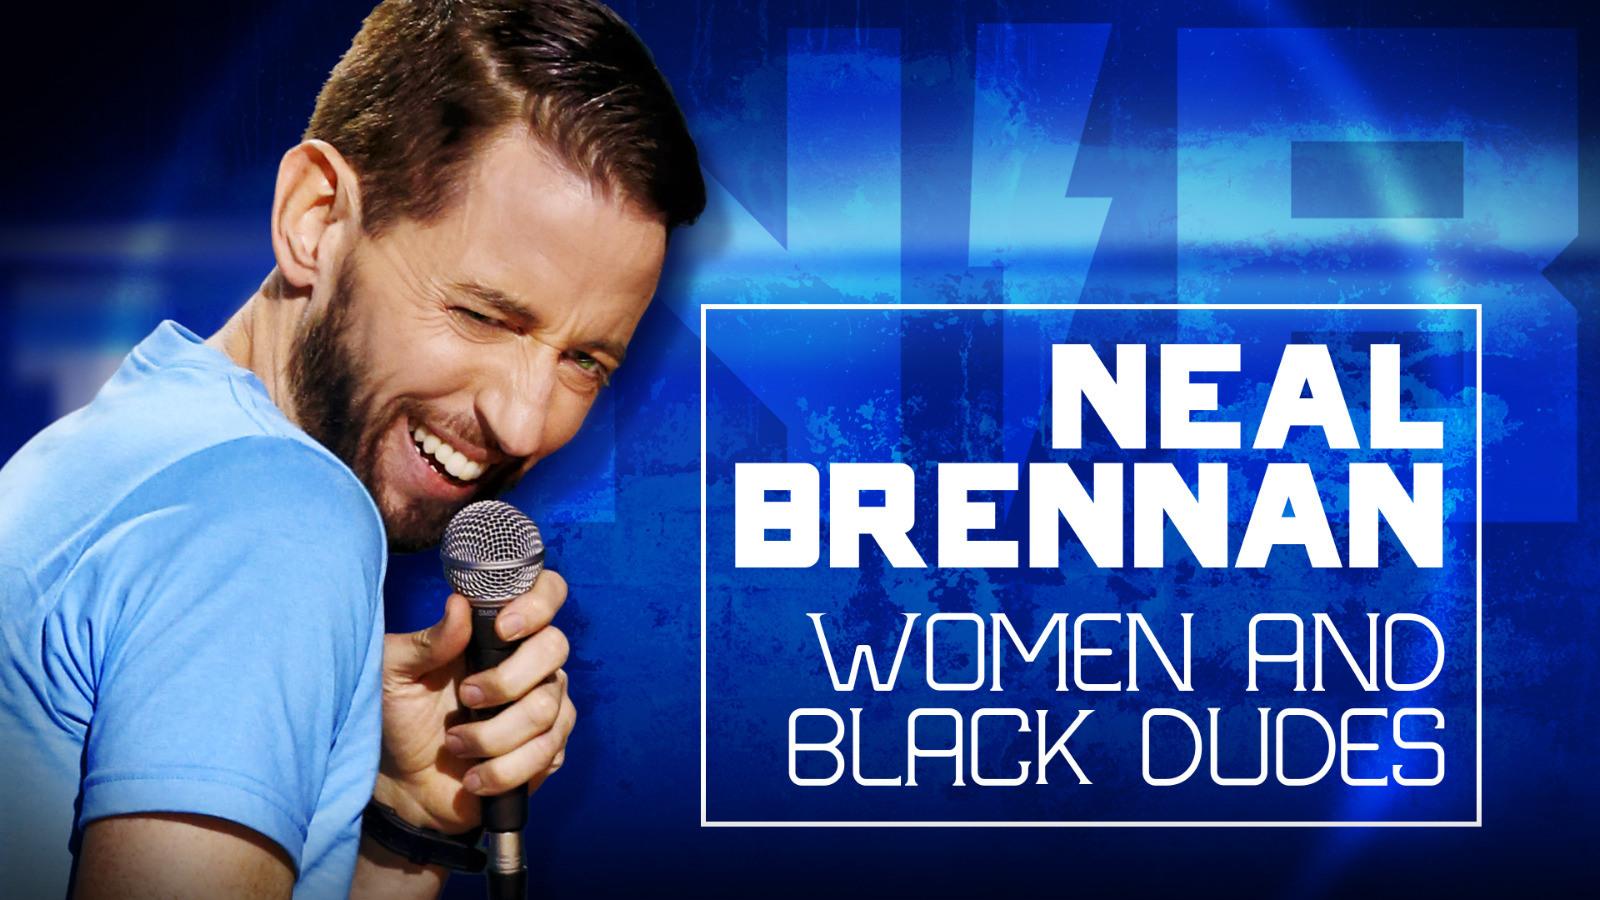 NEAL BRENNAN - WOMEN AND BLACK DUDES